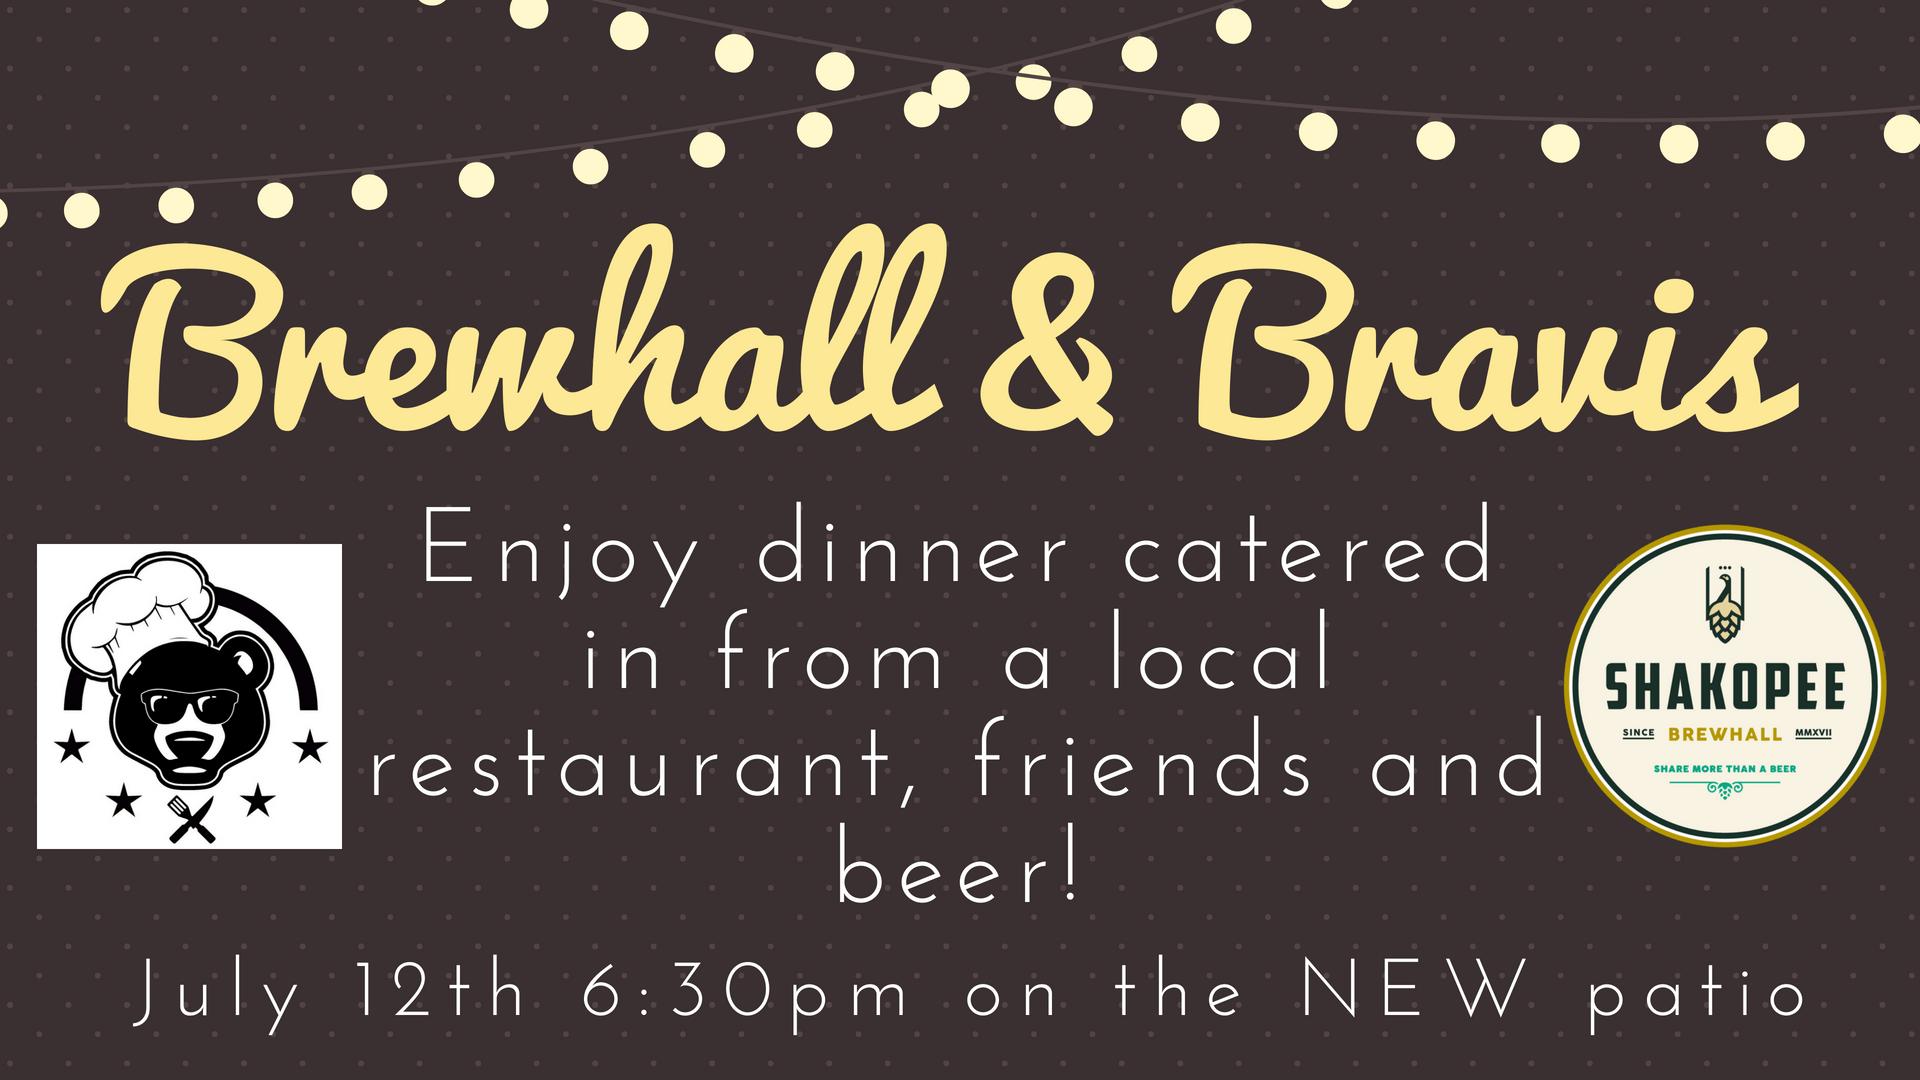 Brewhall & Bravis